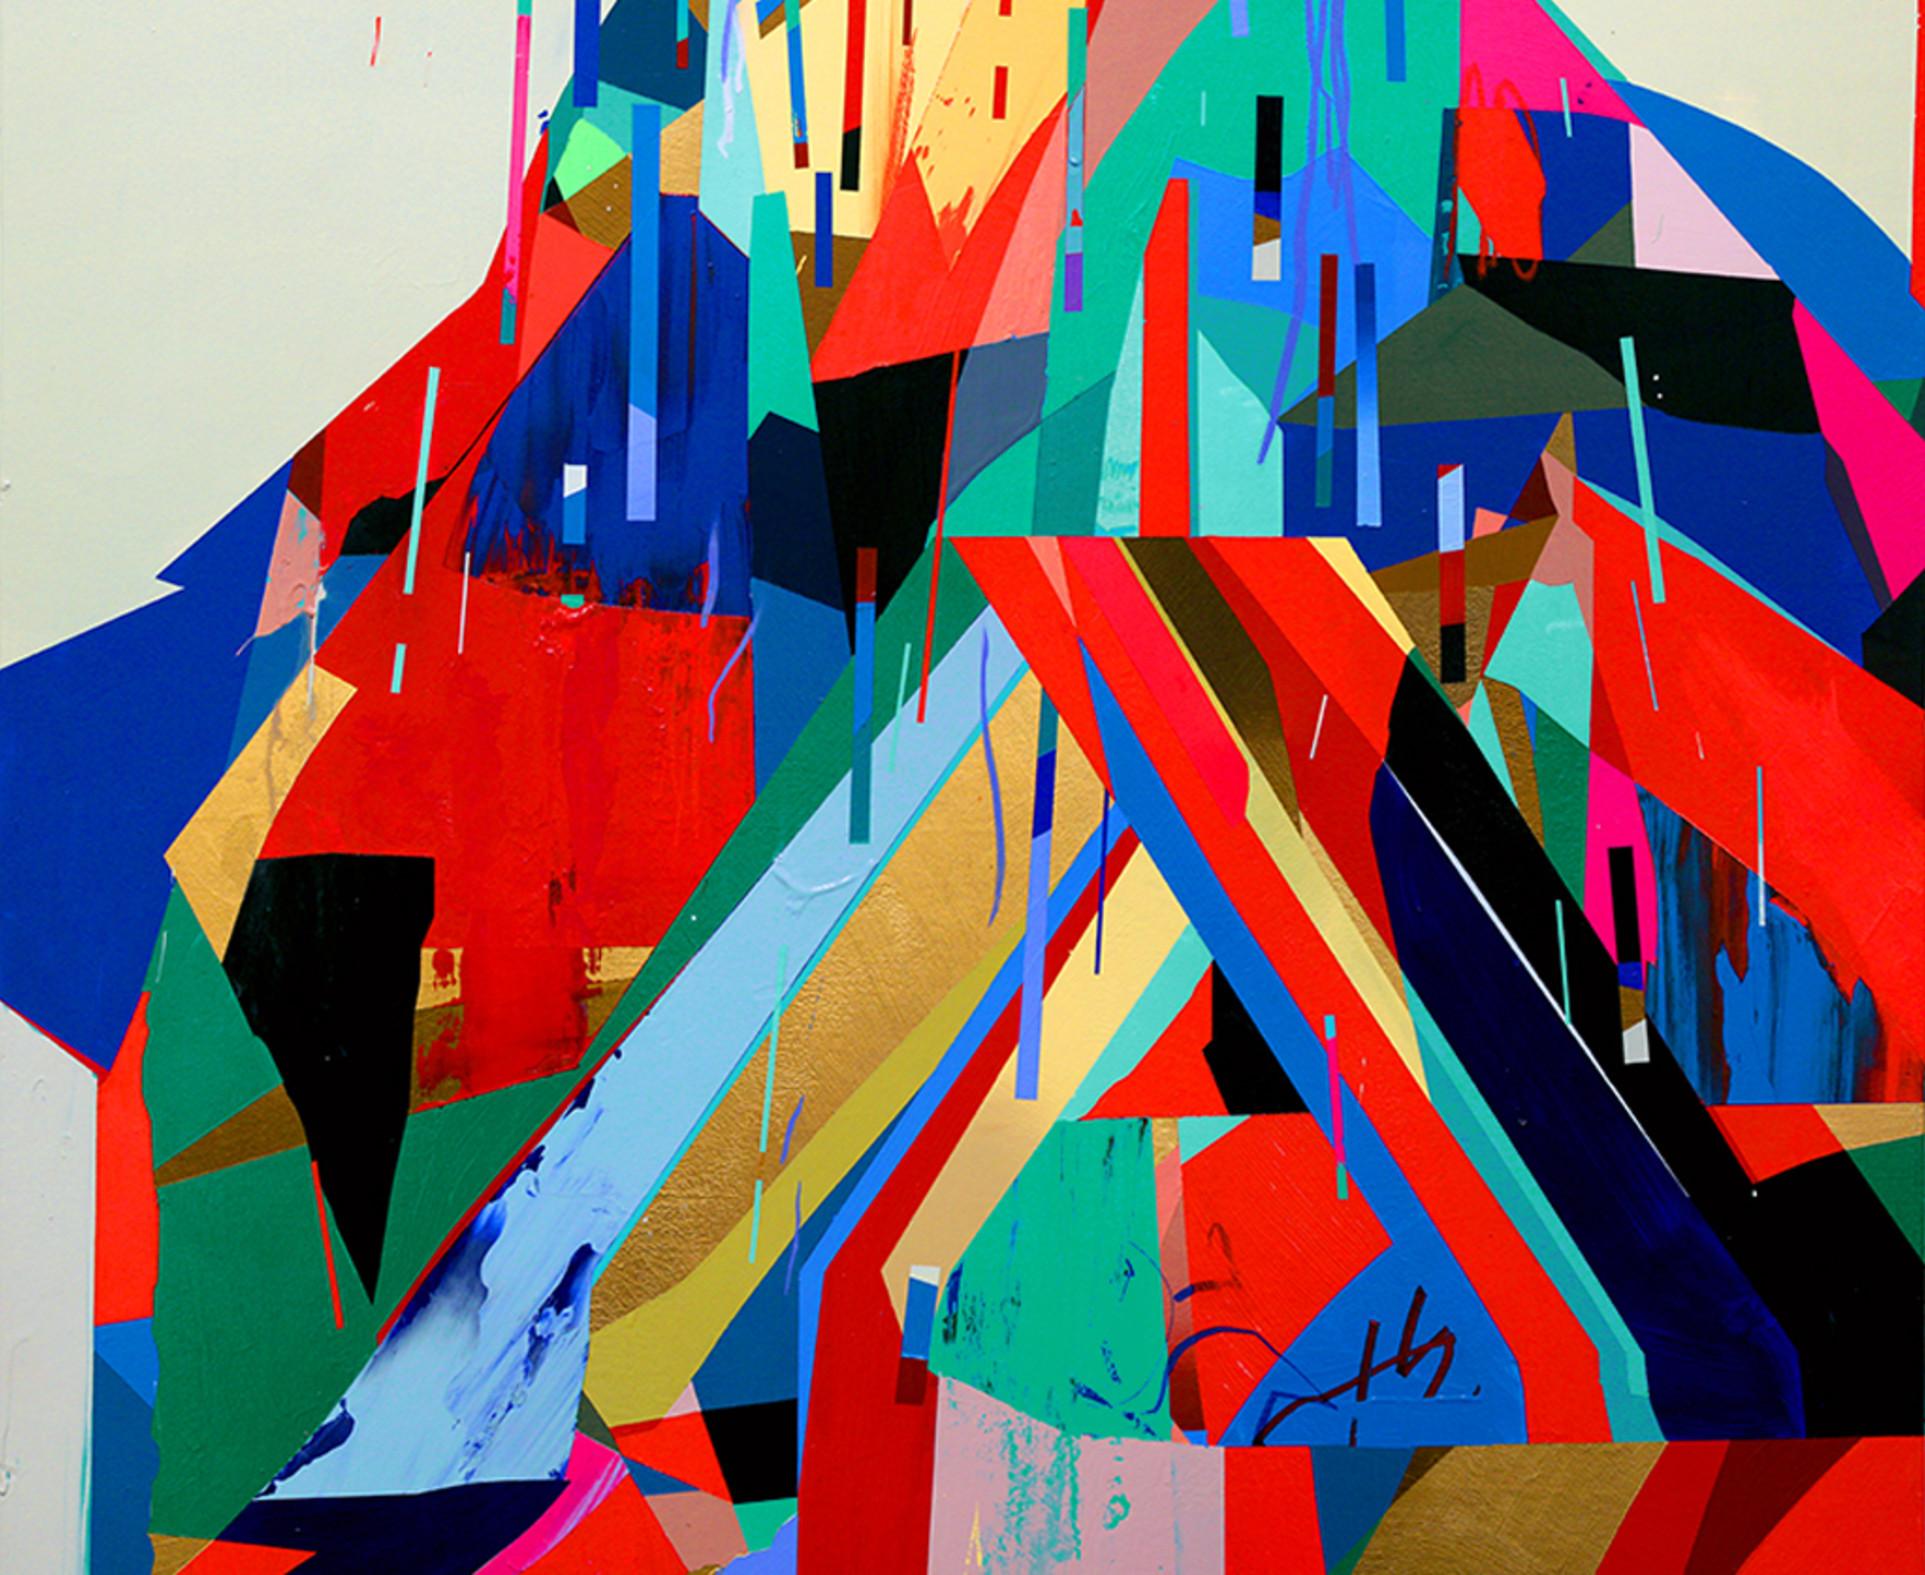 Erik Jones, Bridge On Mountain, 2014